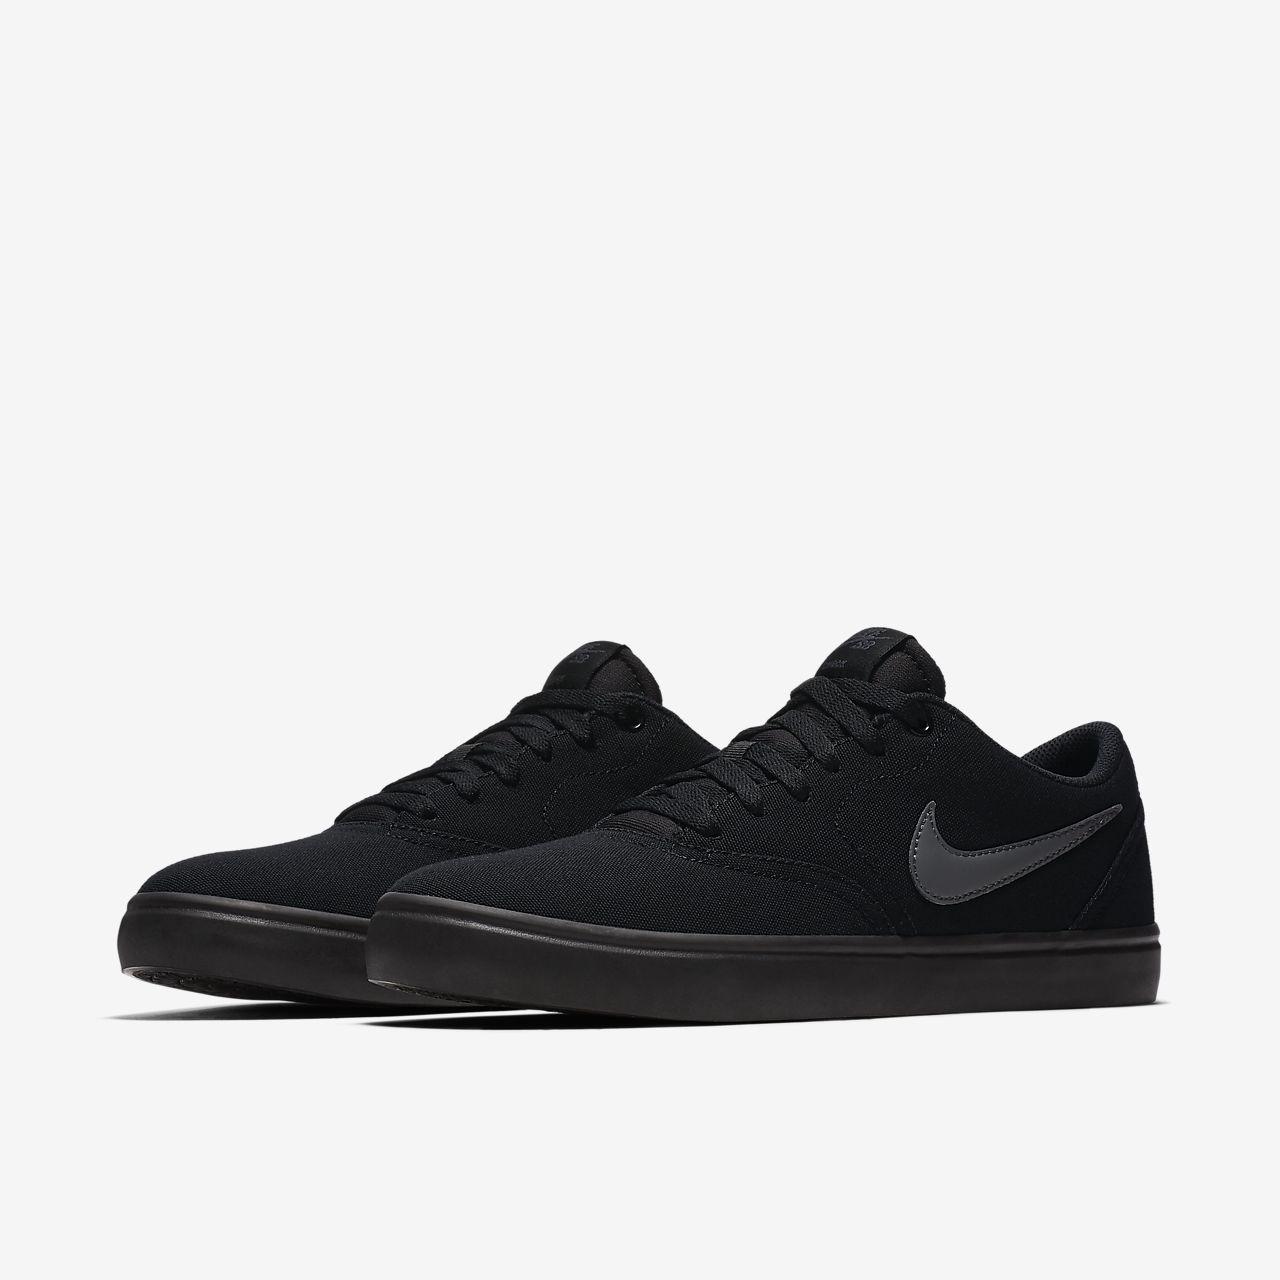 Męskie buty do skateboardingu Nike SB Check Solarsoft Canvas